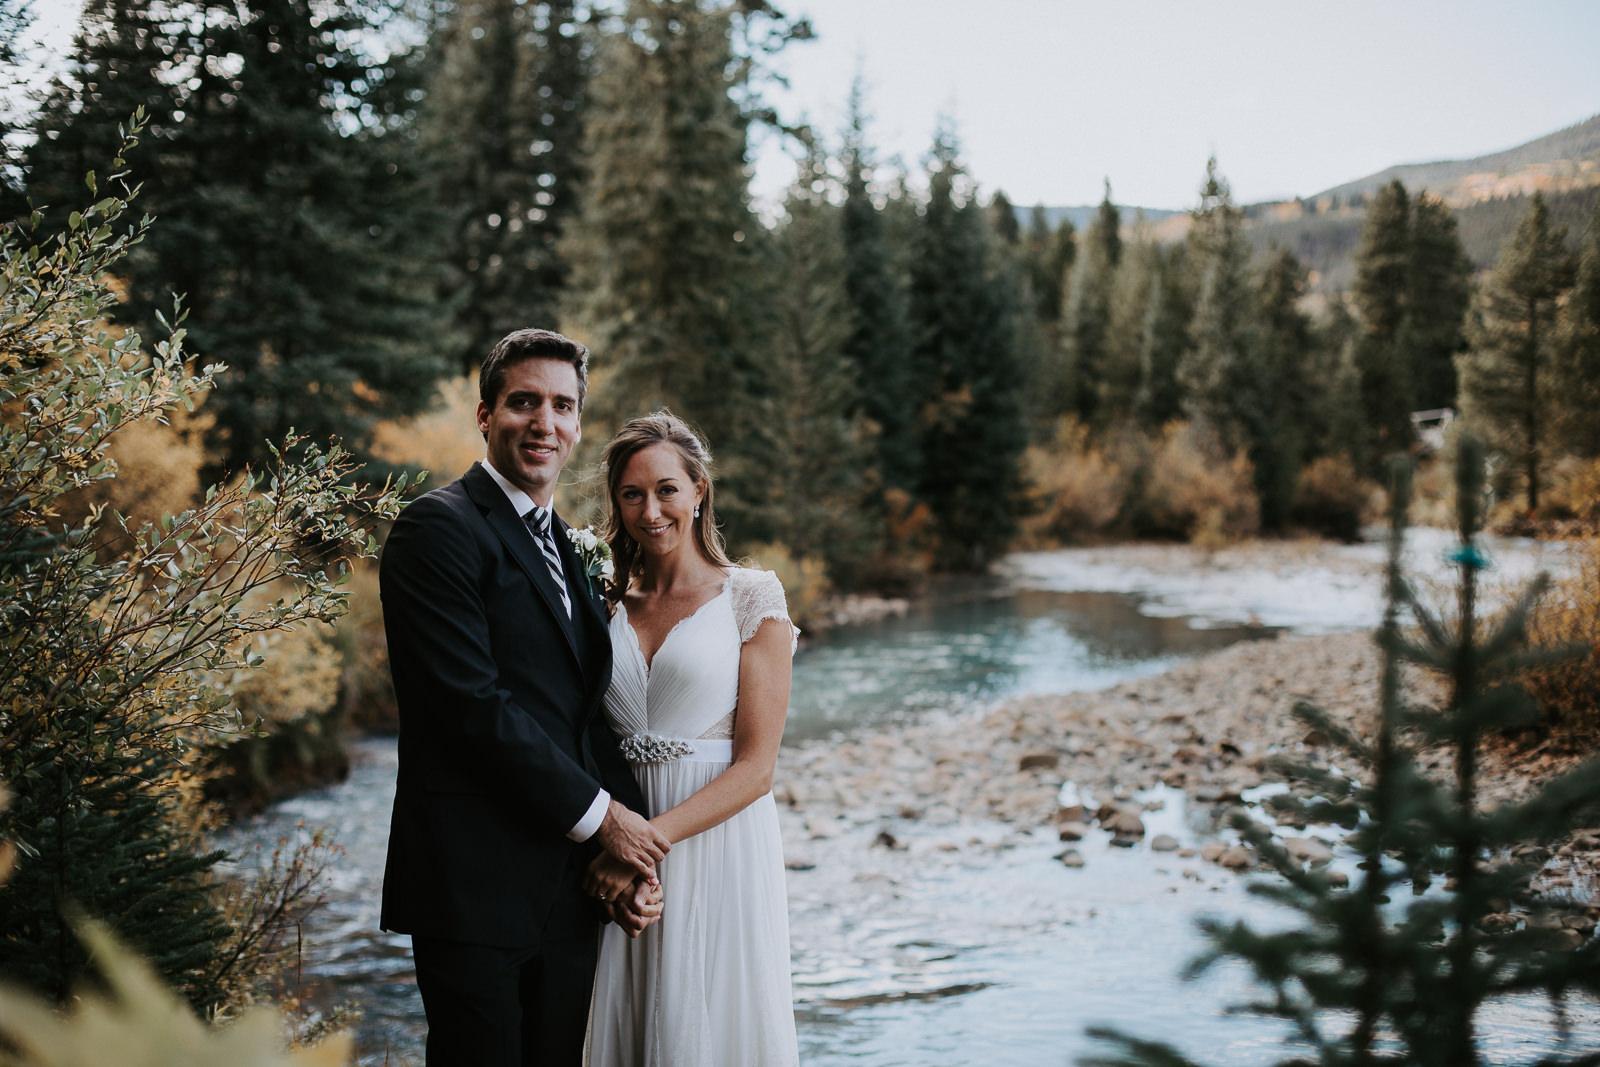 Quaking Aspen Amphitheater wedding fall colors Keystone Colorado pine trees